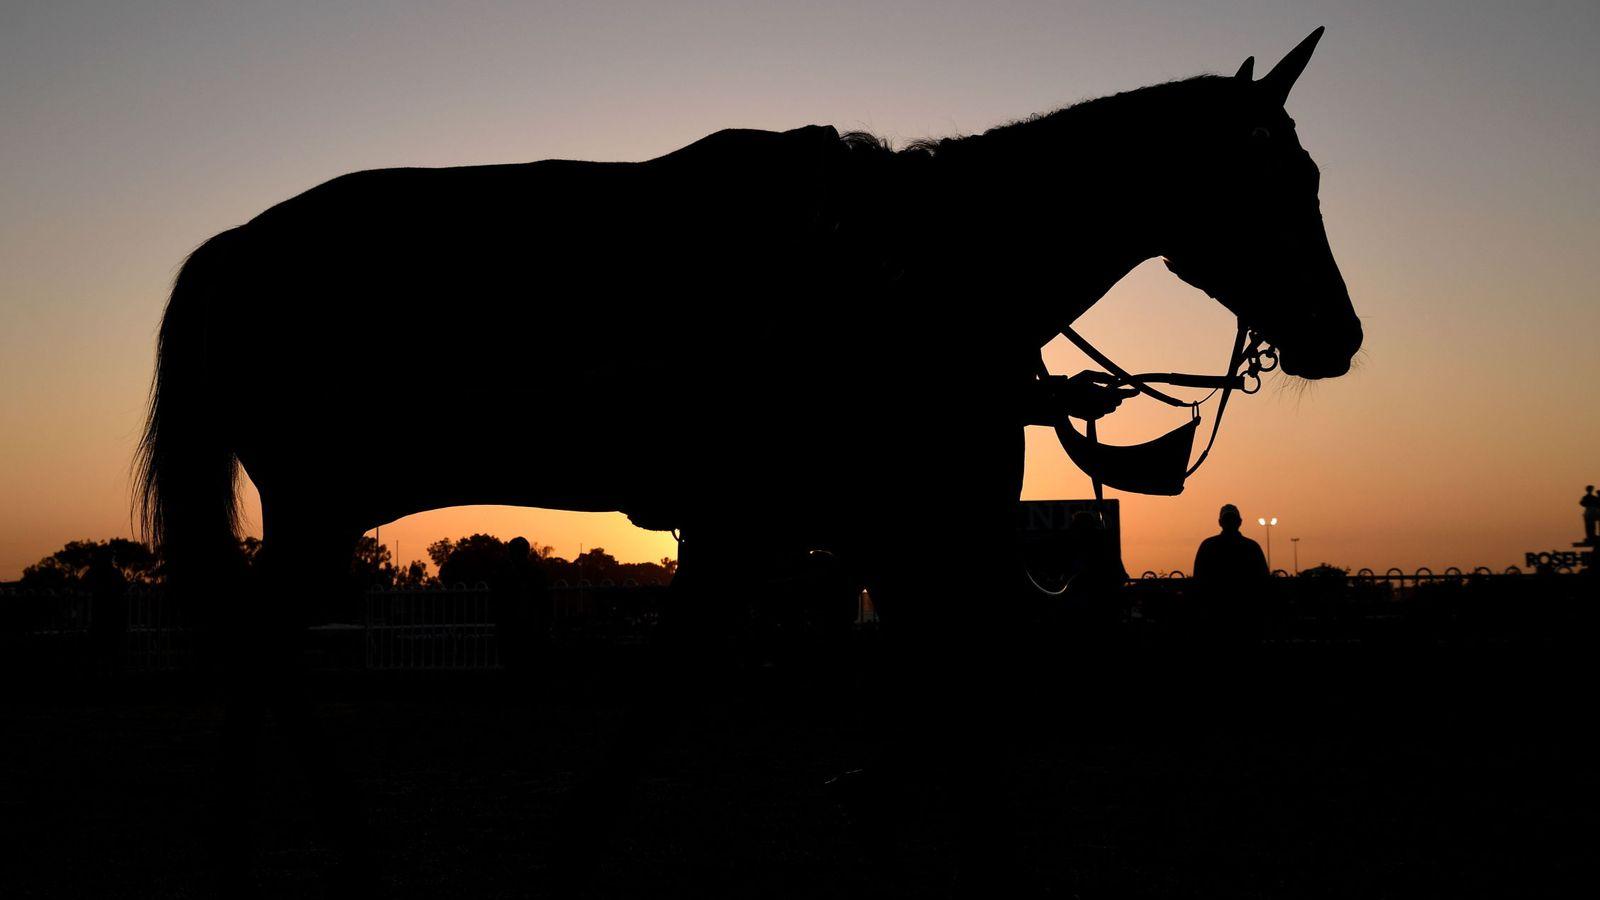 Foto: La firma de capital riesgo ha elegido como imagen corporativa la silueta de un caballo.